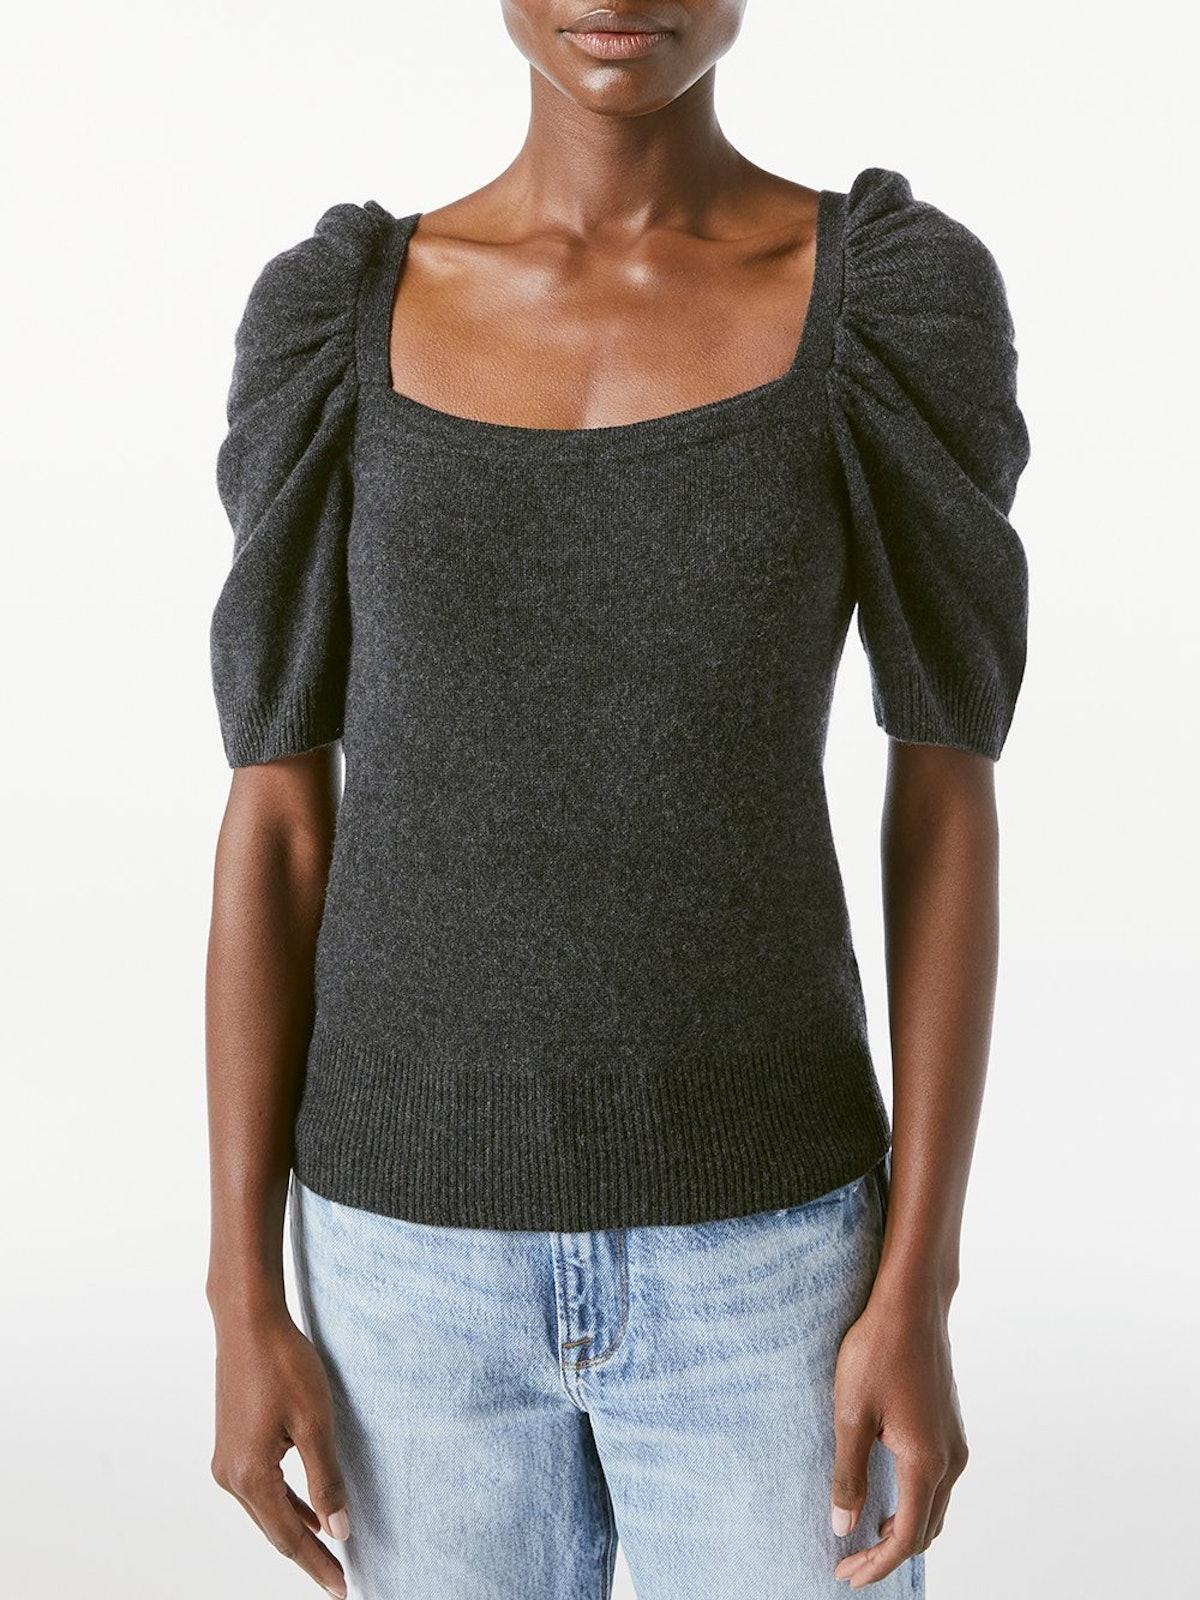 Femme Square Neck Short Sleeve